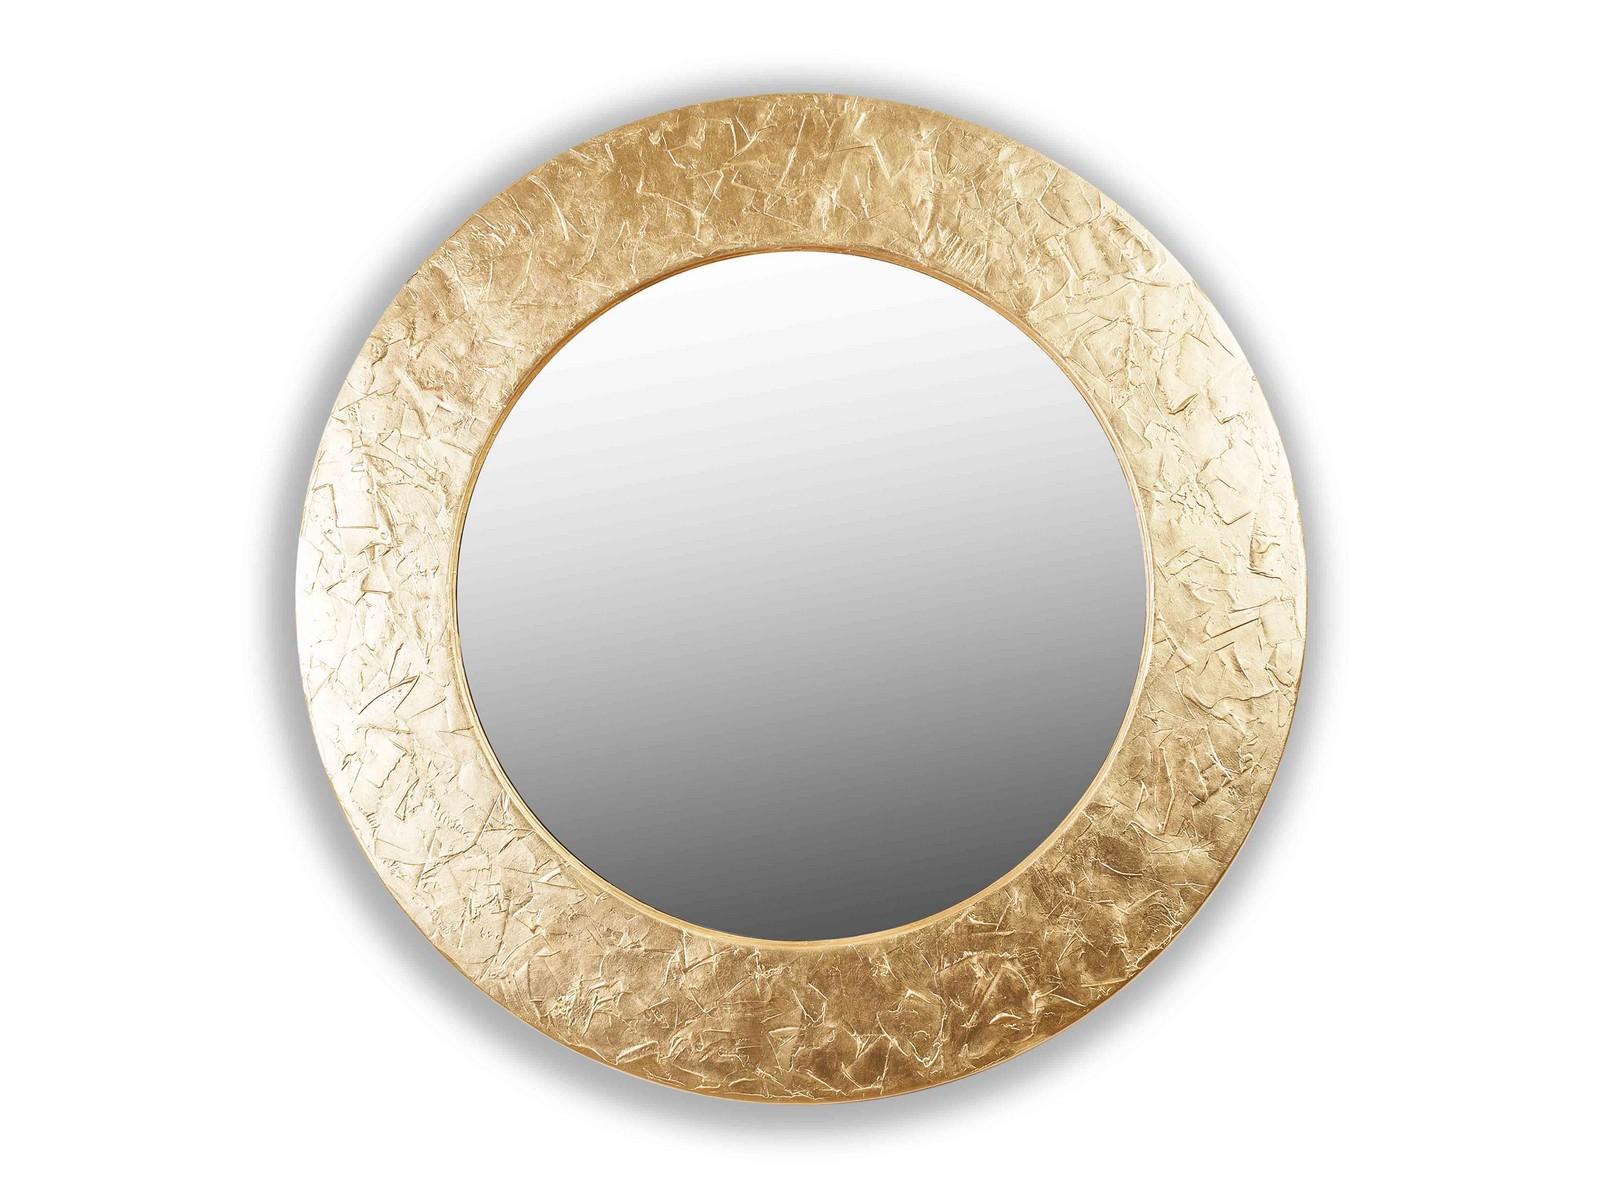 Зеркало FASHION STROKESНастенные зеркала<br>Данный вариант представлен в золотом цвете.<br><br>Material: Дерево<br>Глубина см: 3